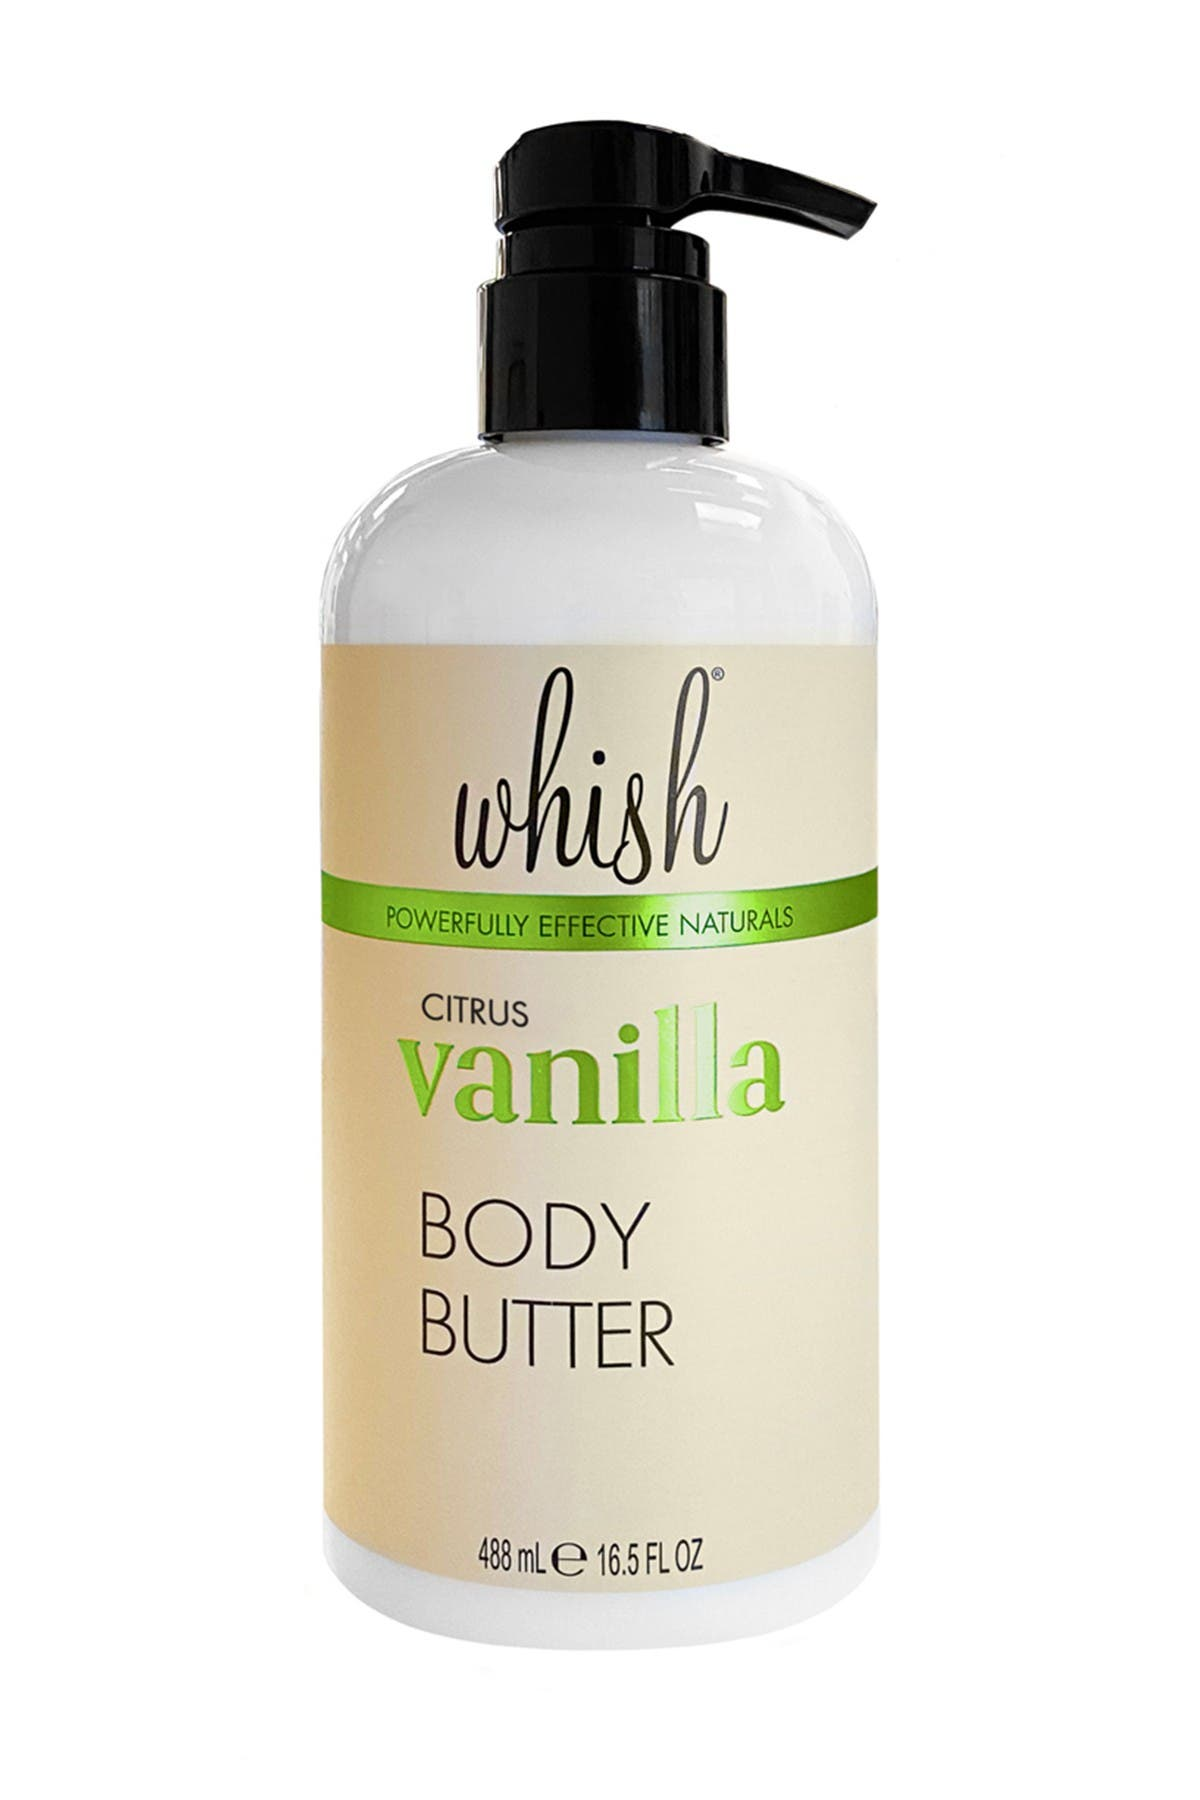 Image of Whish Citrus Vanilla Body Butter